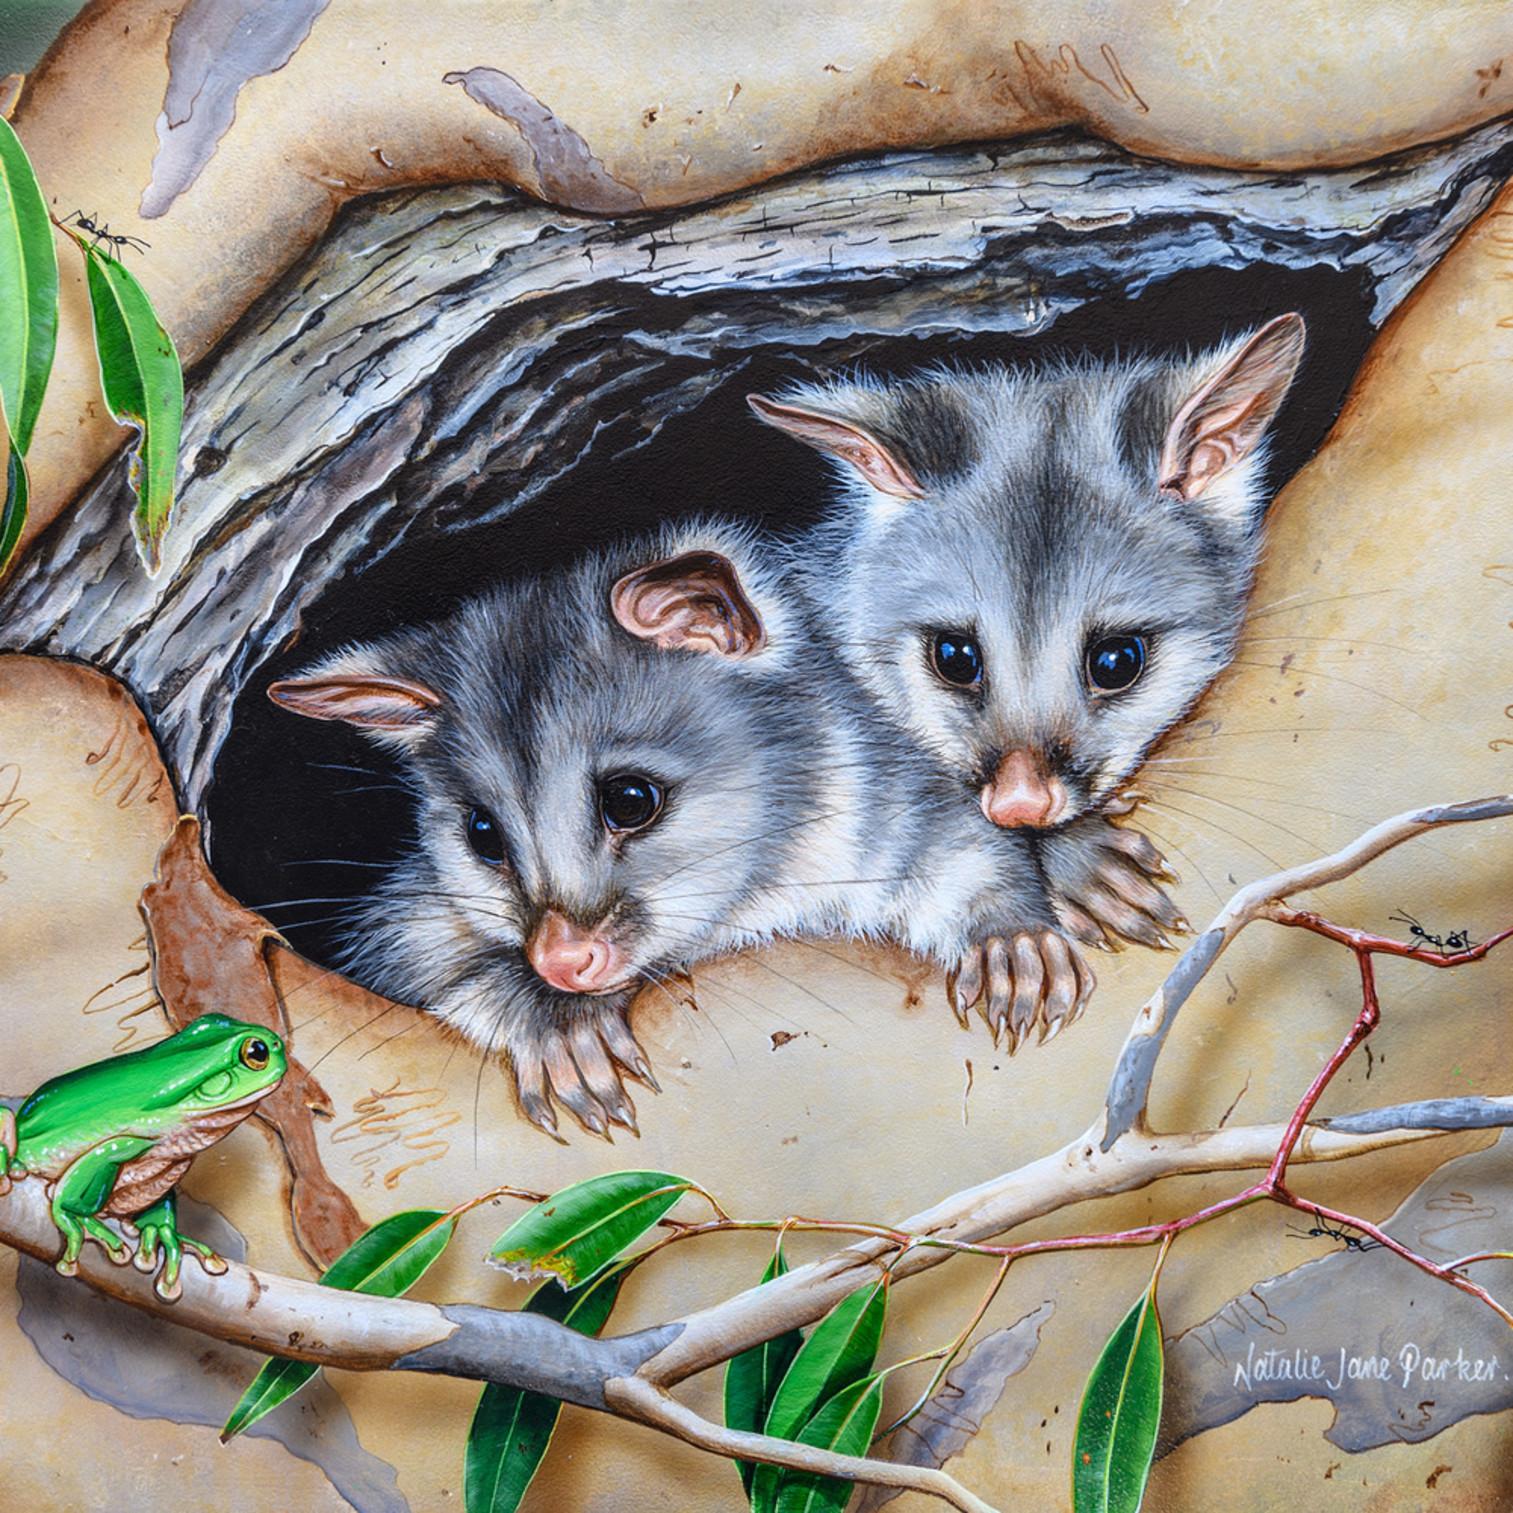 Cosy home   common brushtail possum natalie jane parker australian native wildlife qe7bvk